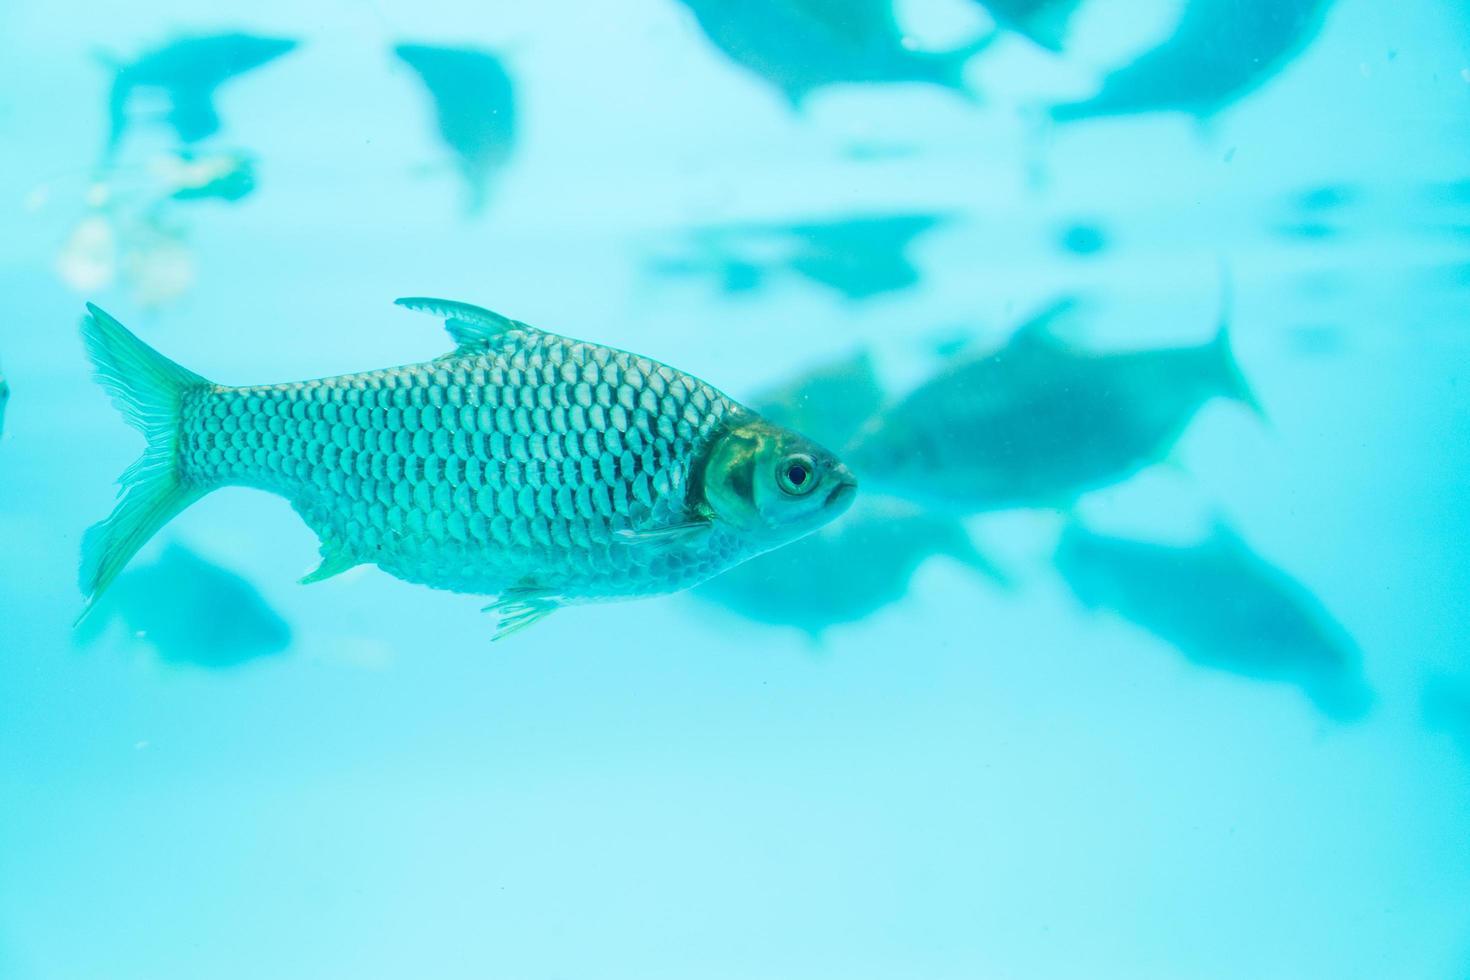 Thai carp fish in blue water photo